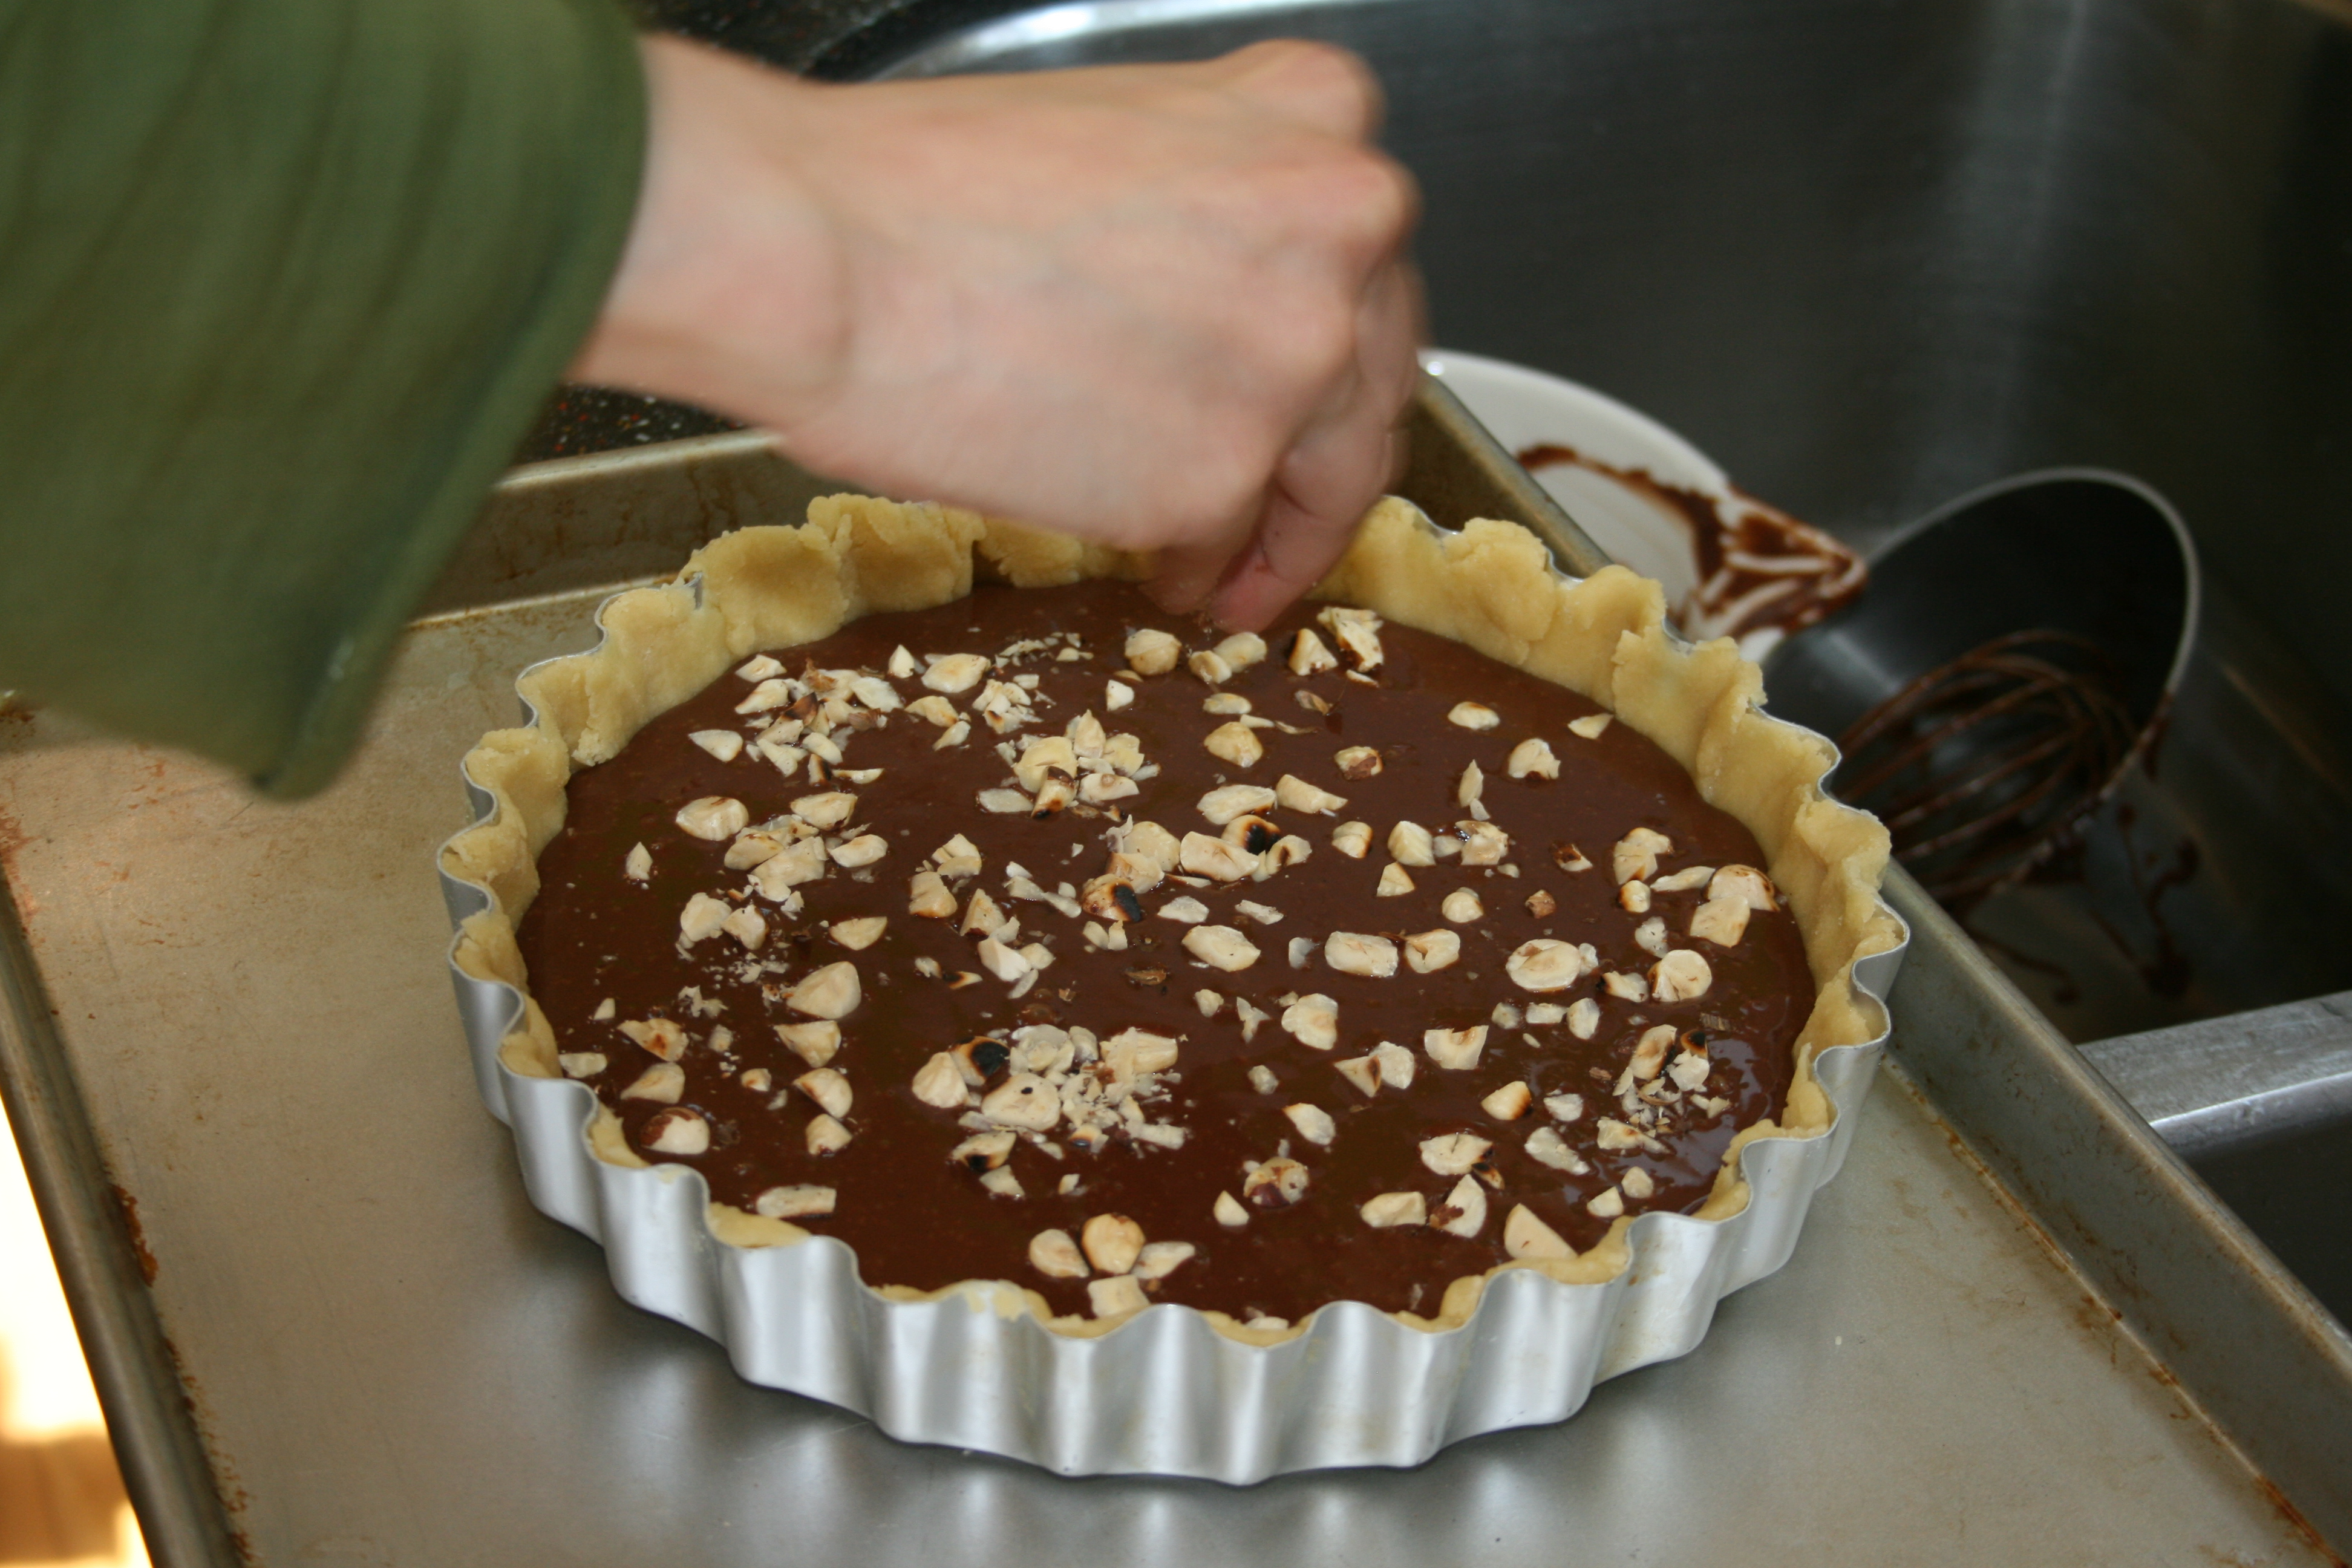 ... Baker Challenge: Chocolate Orange Hazelnut Tart | Three Clever Sisters